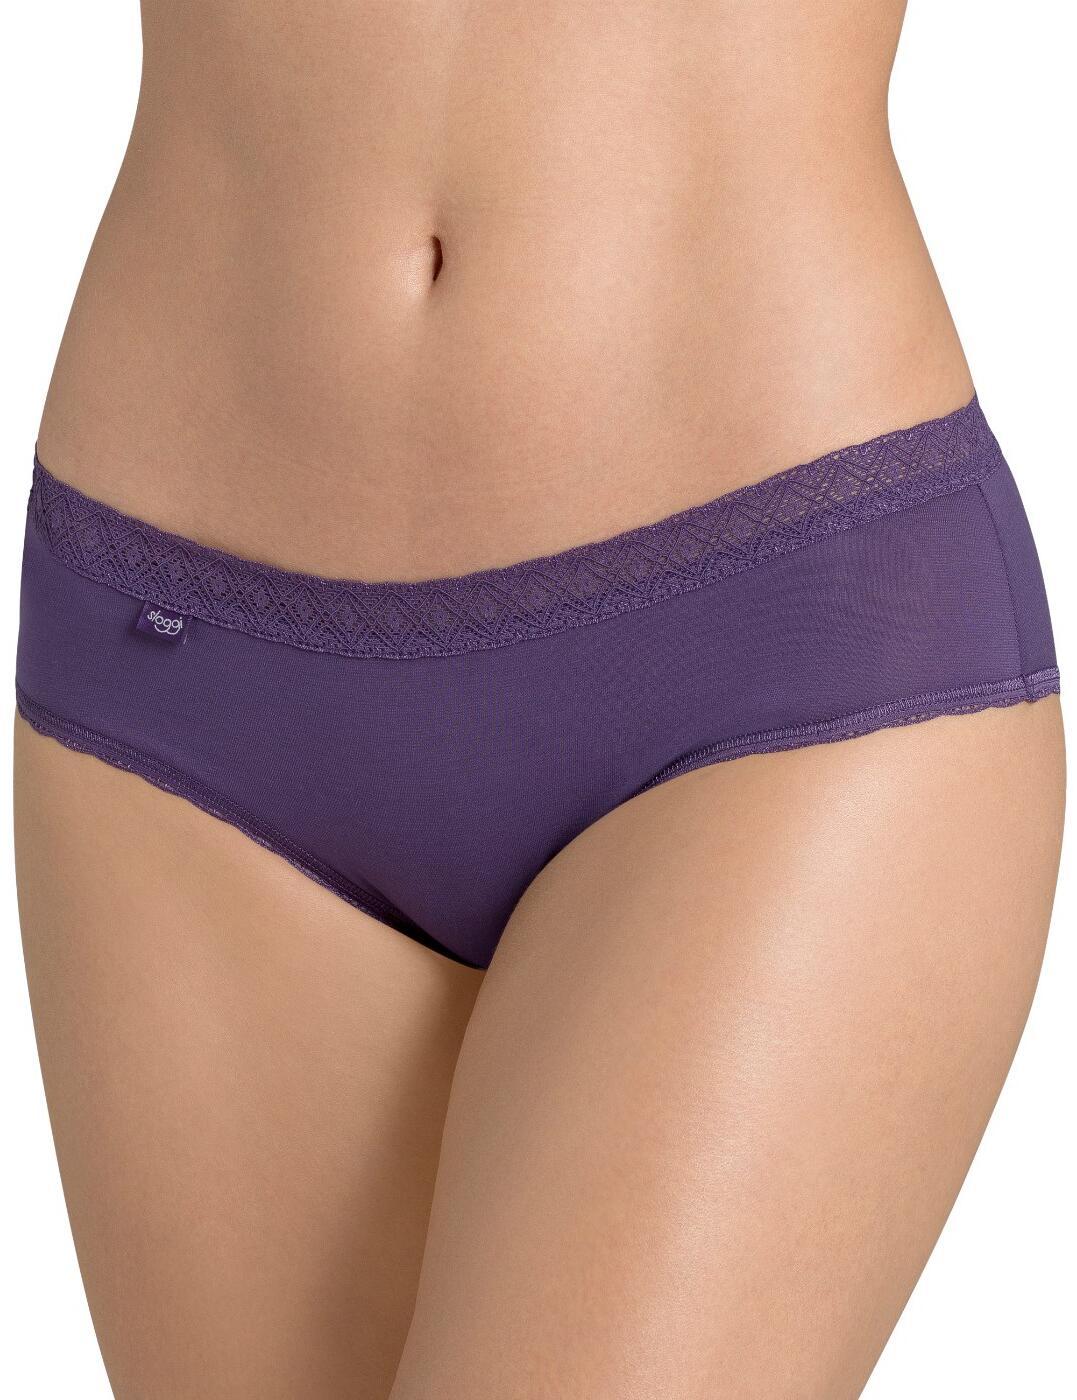 10162961 Sloggi EverNew Lace Hipster - 10162961 Dark Purple